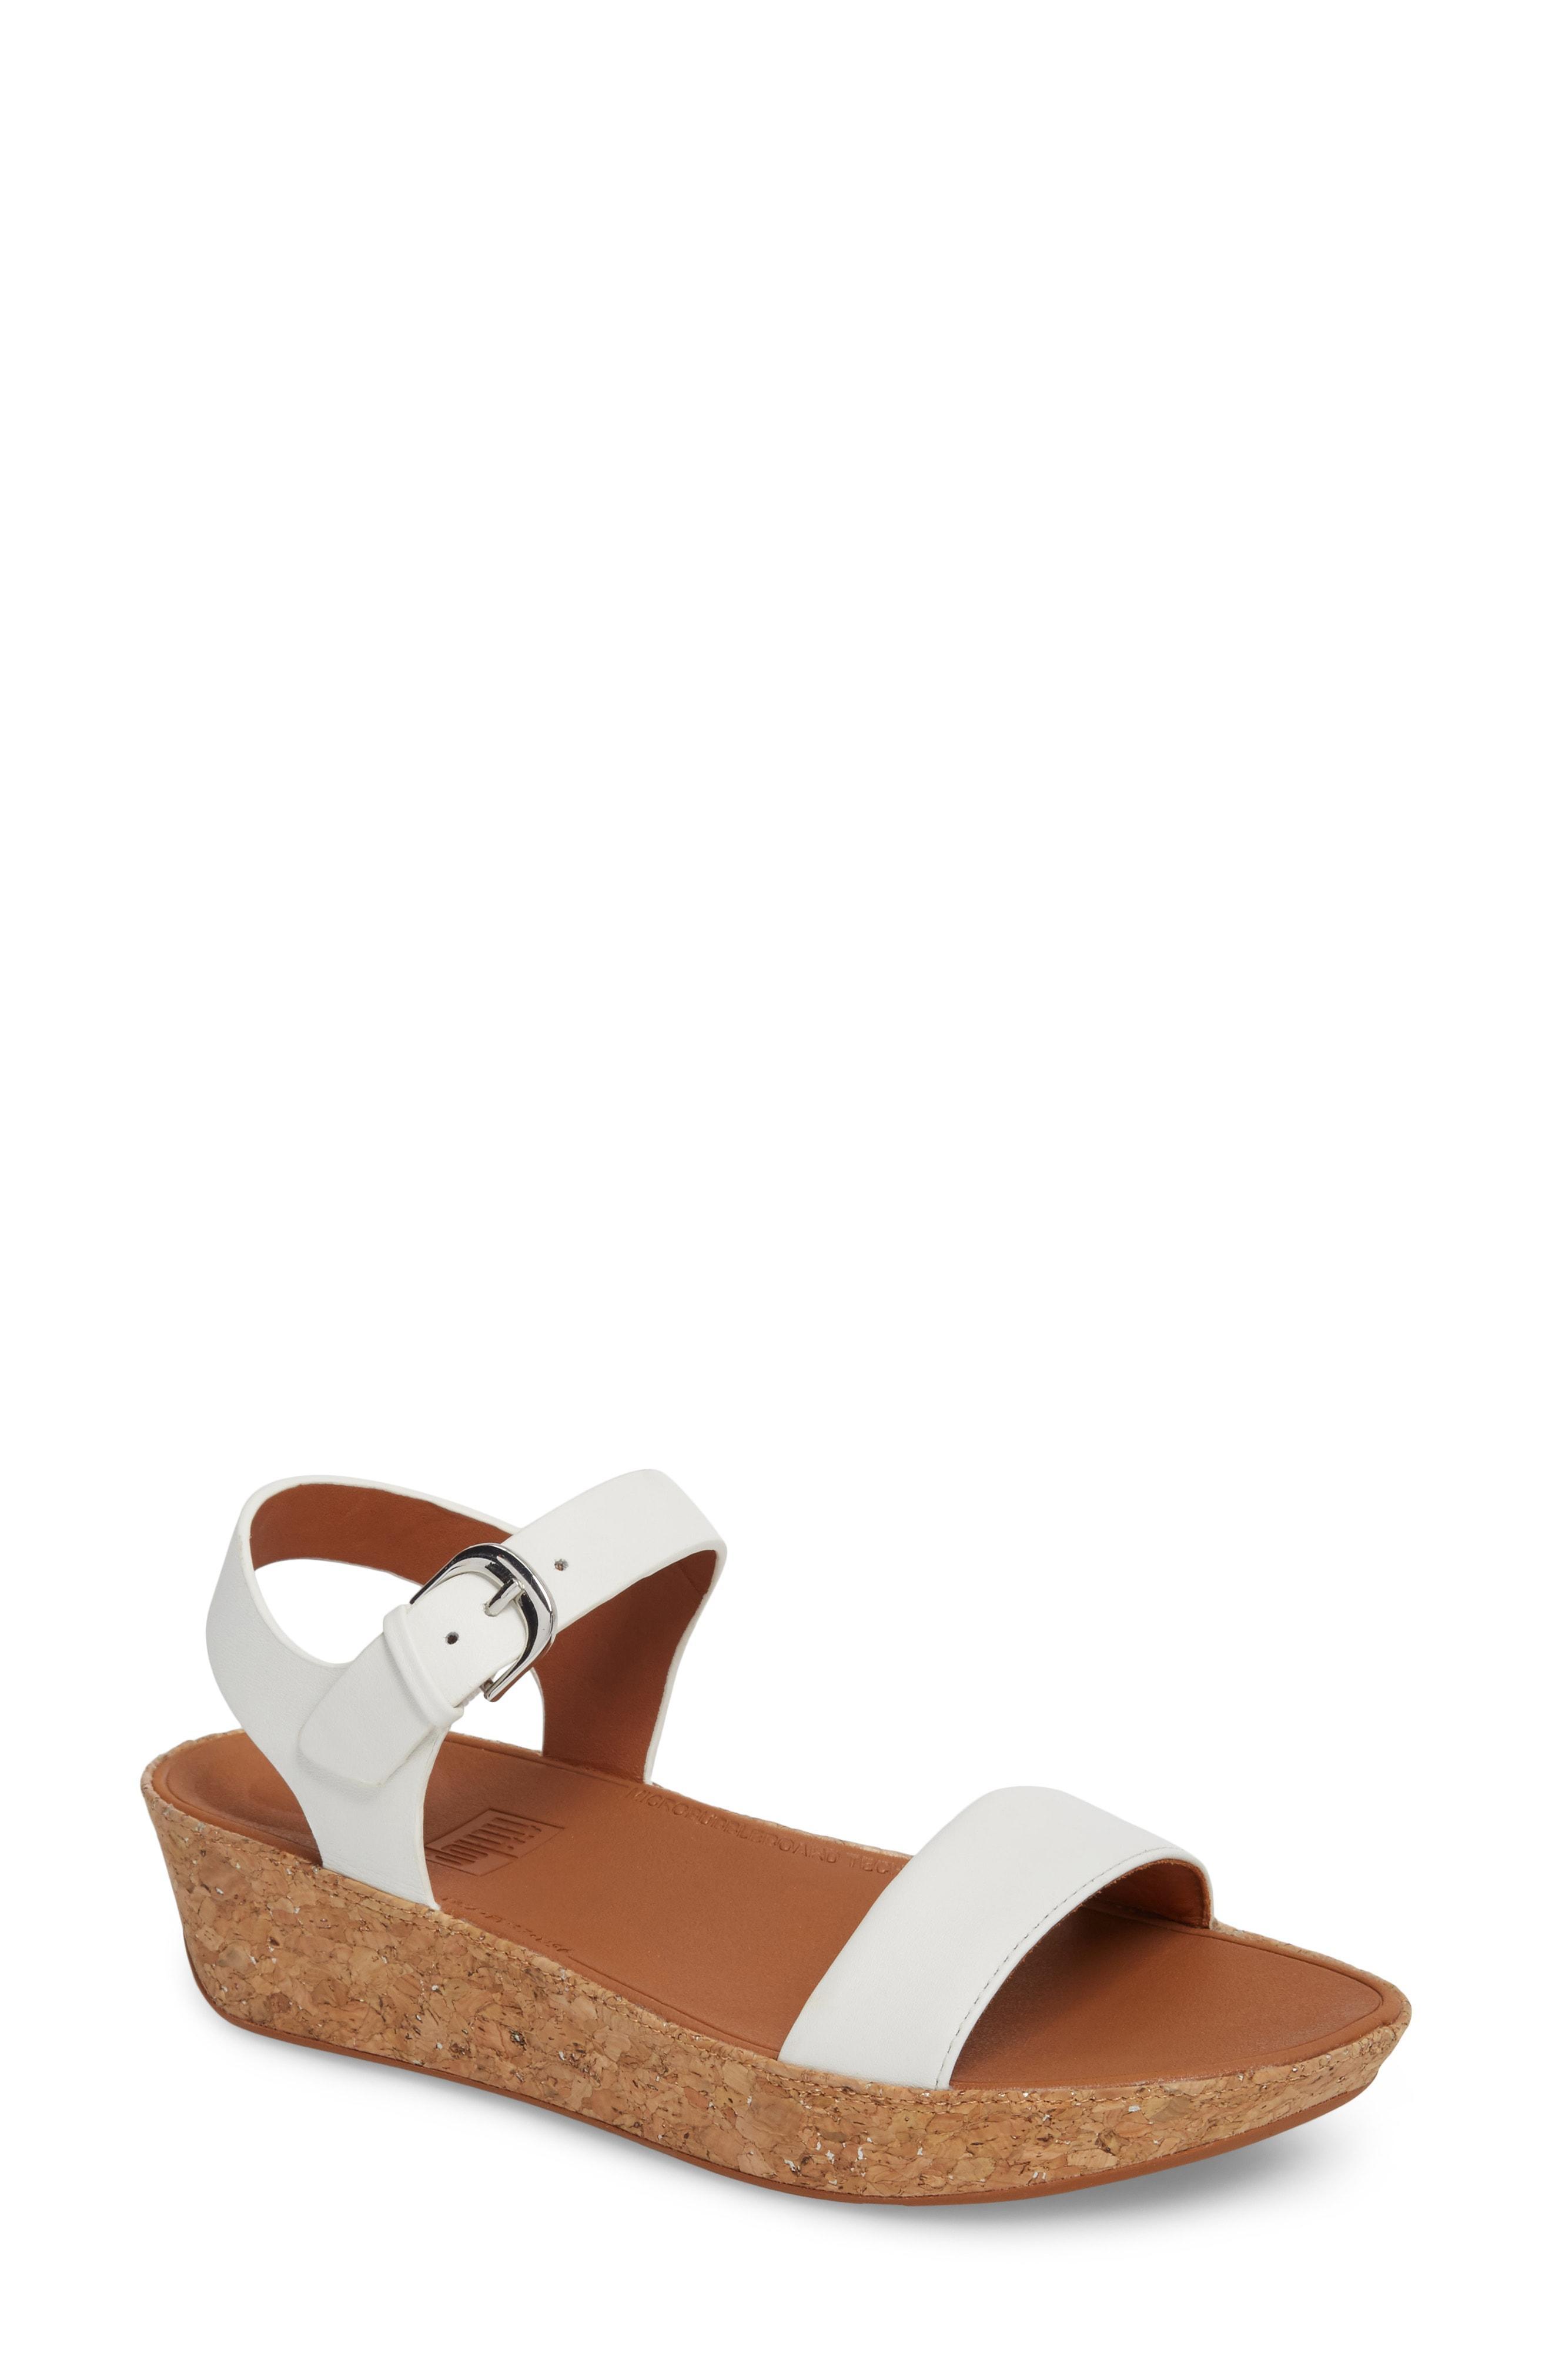 f5b4cc32d Fitflop Bon Ii Platform Sandal In Urban White Leather